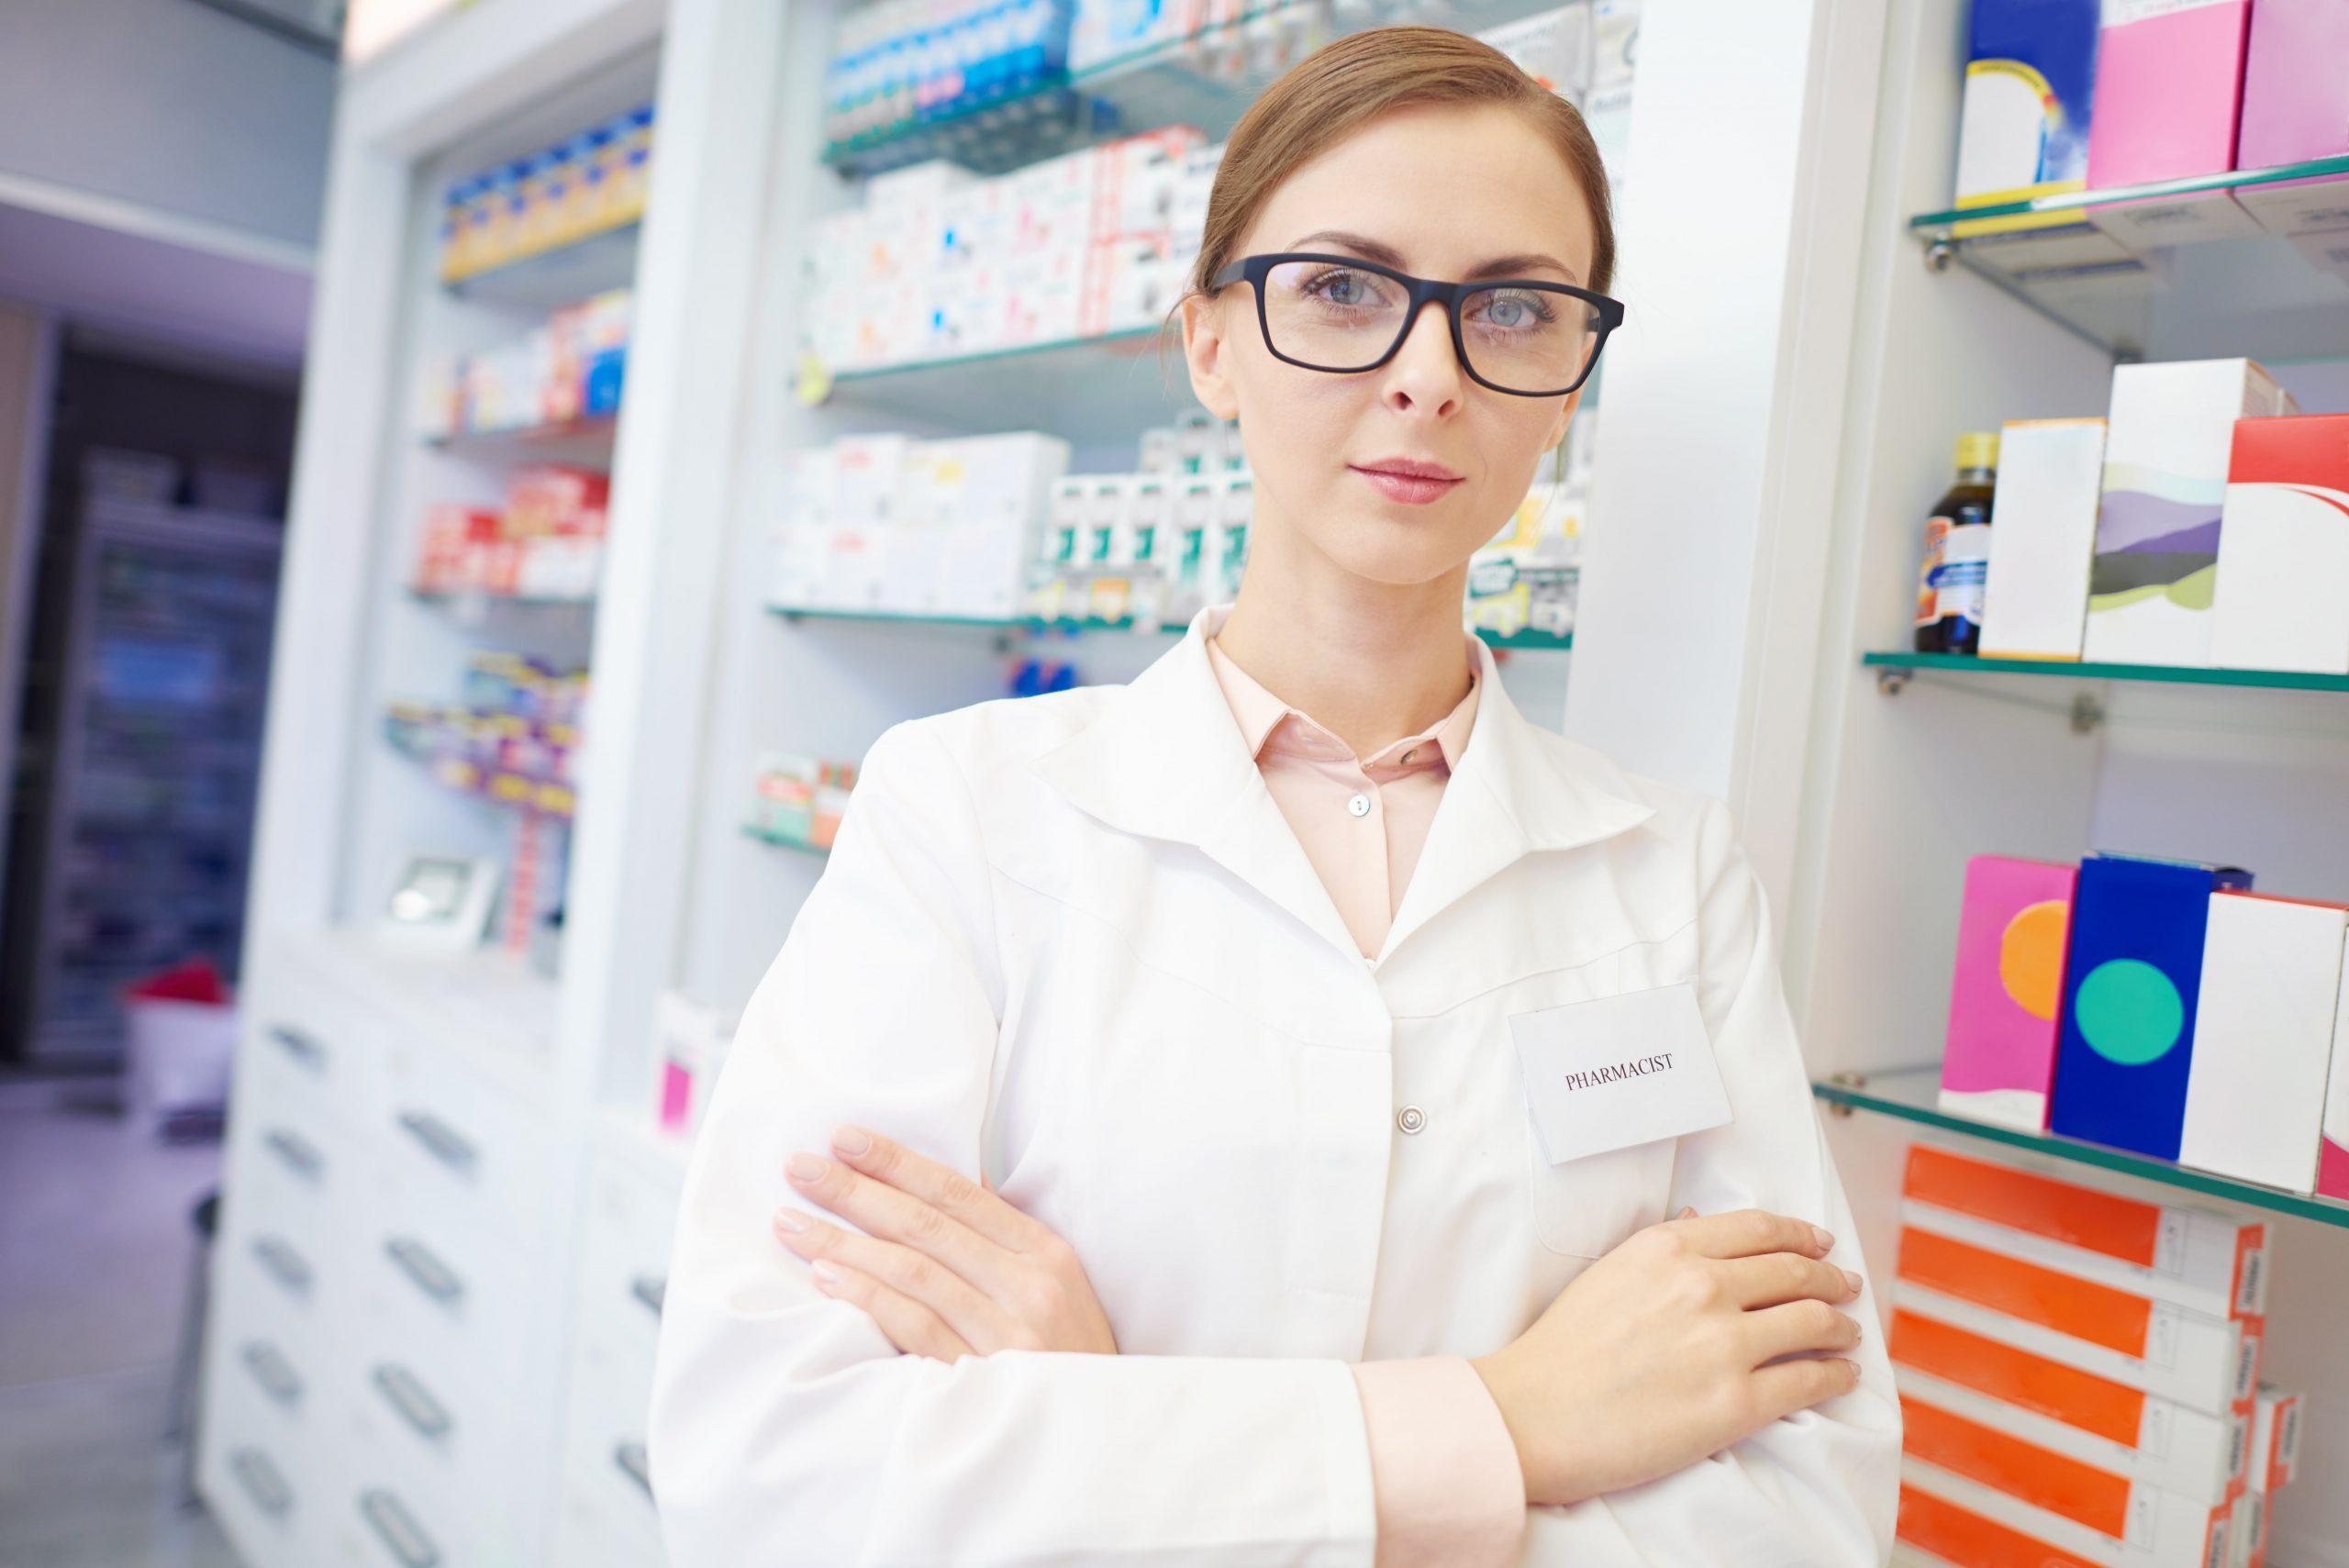 portrait-of-confident-pharmacist-at-drug-store-9R8NQQK-min